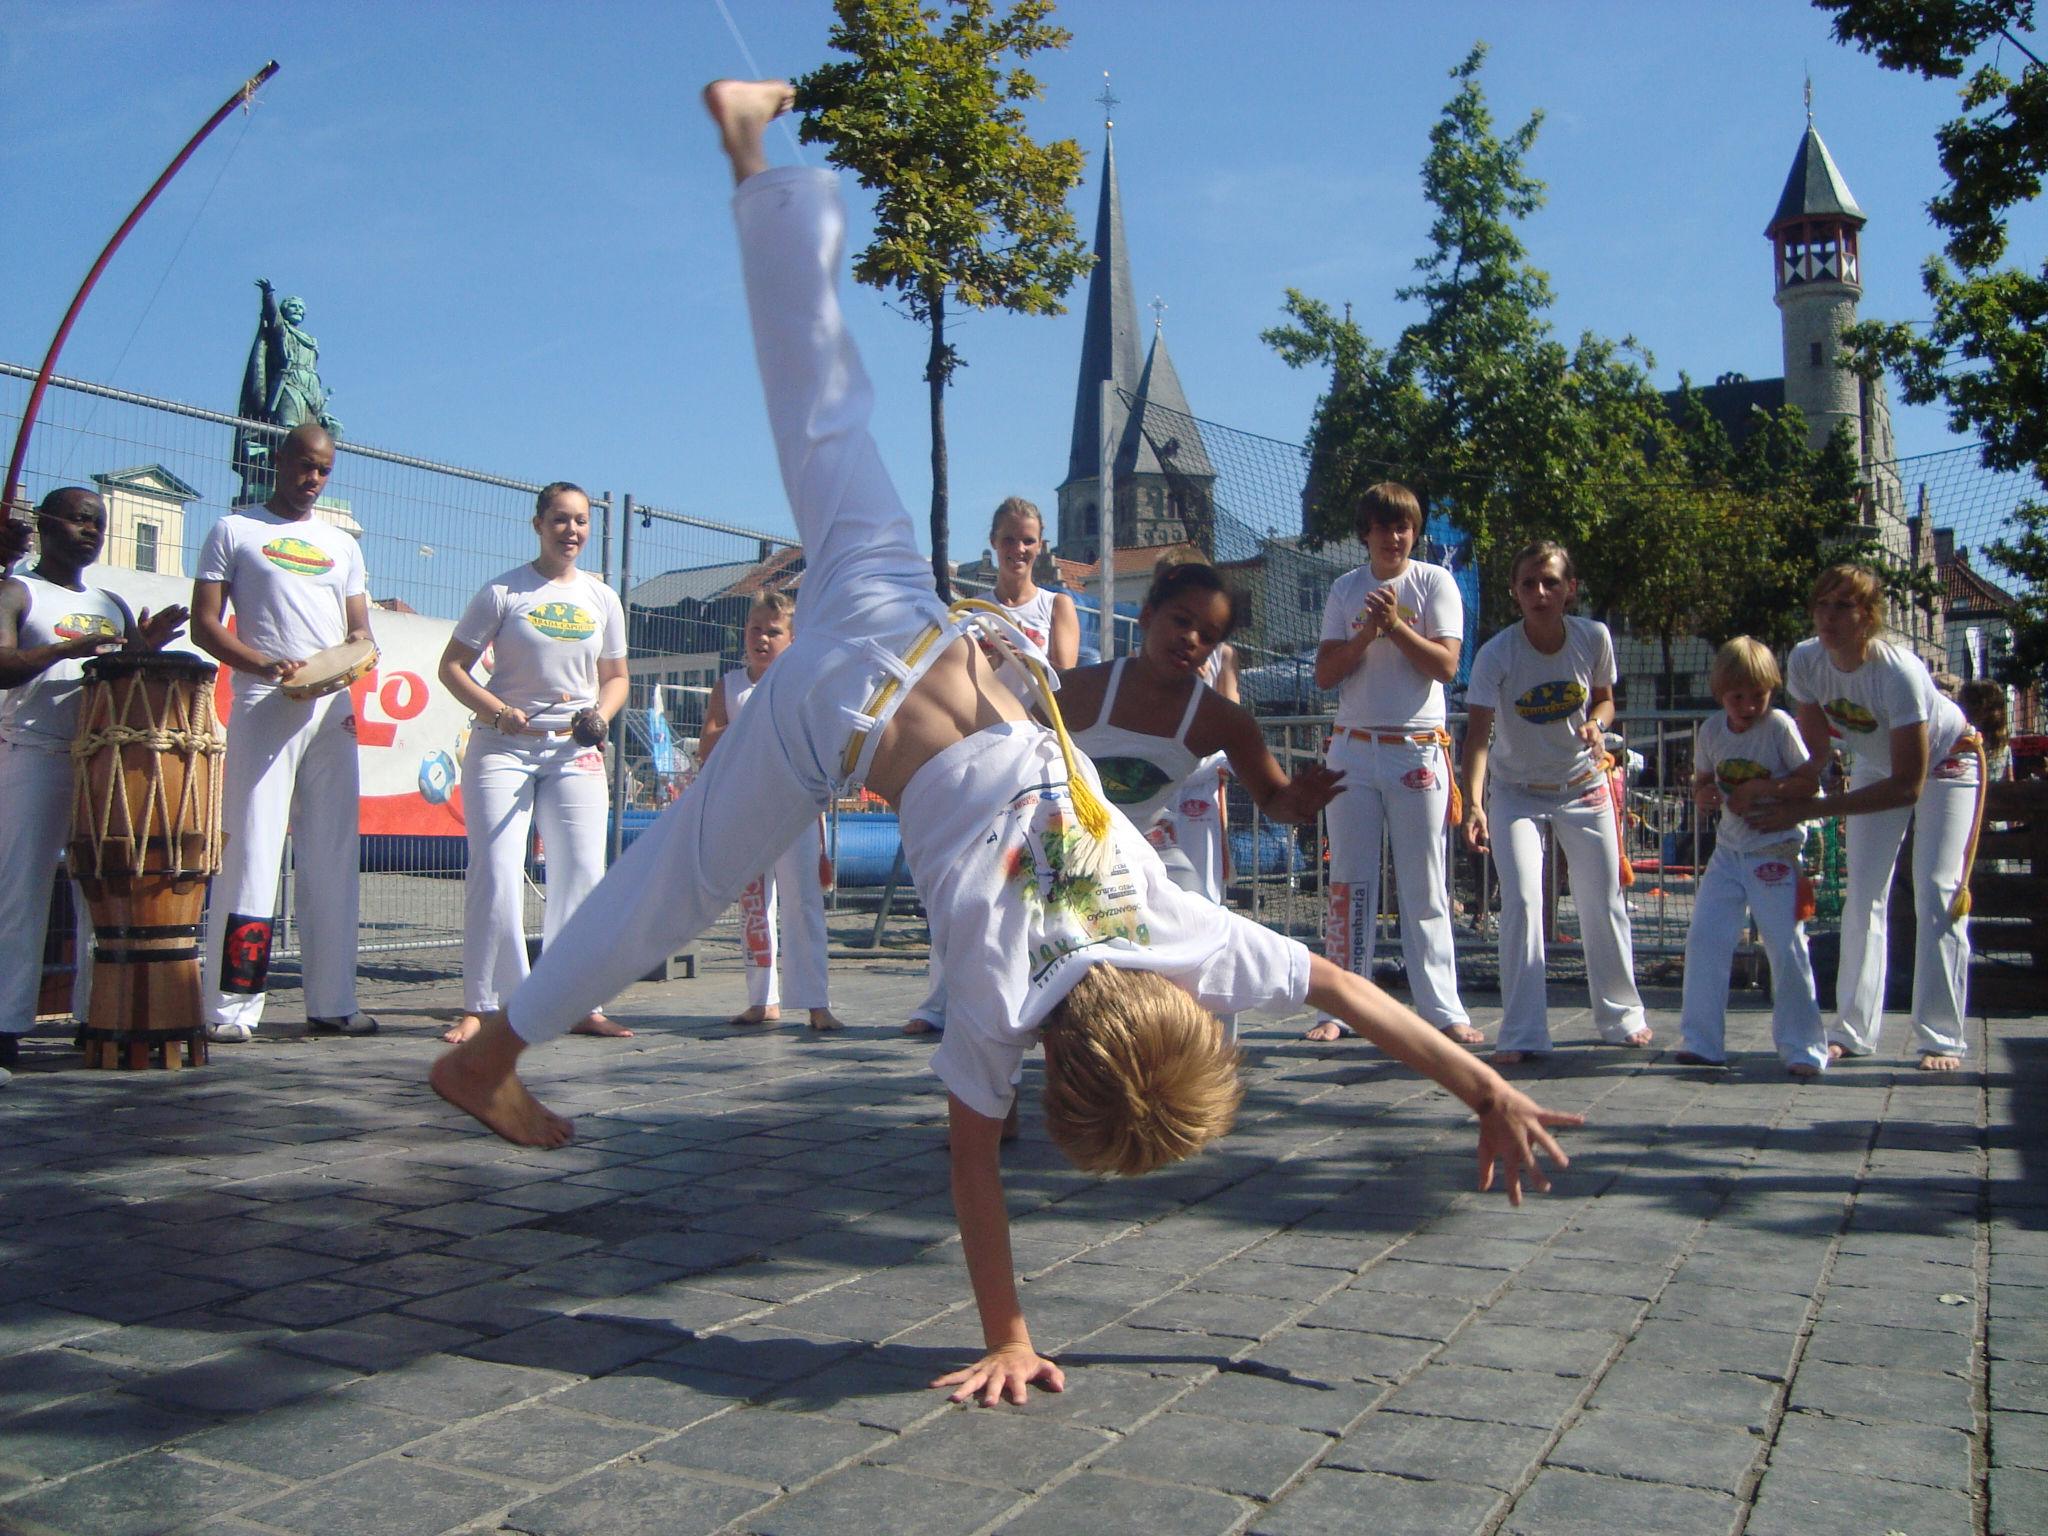 Capoeira-Gent-Sportief-Vrijdagsmarkt-026